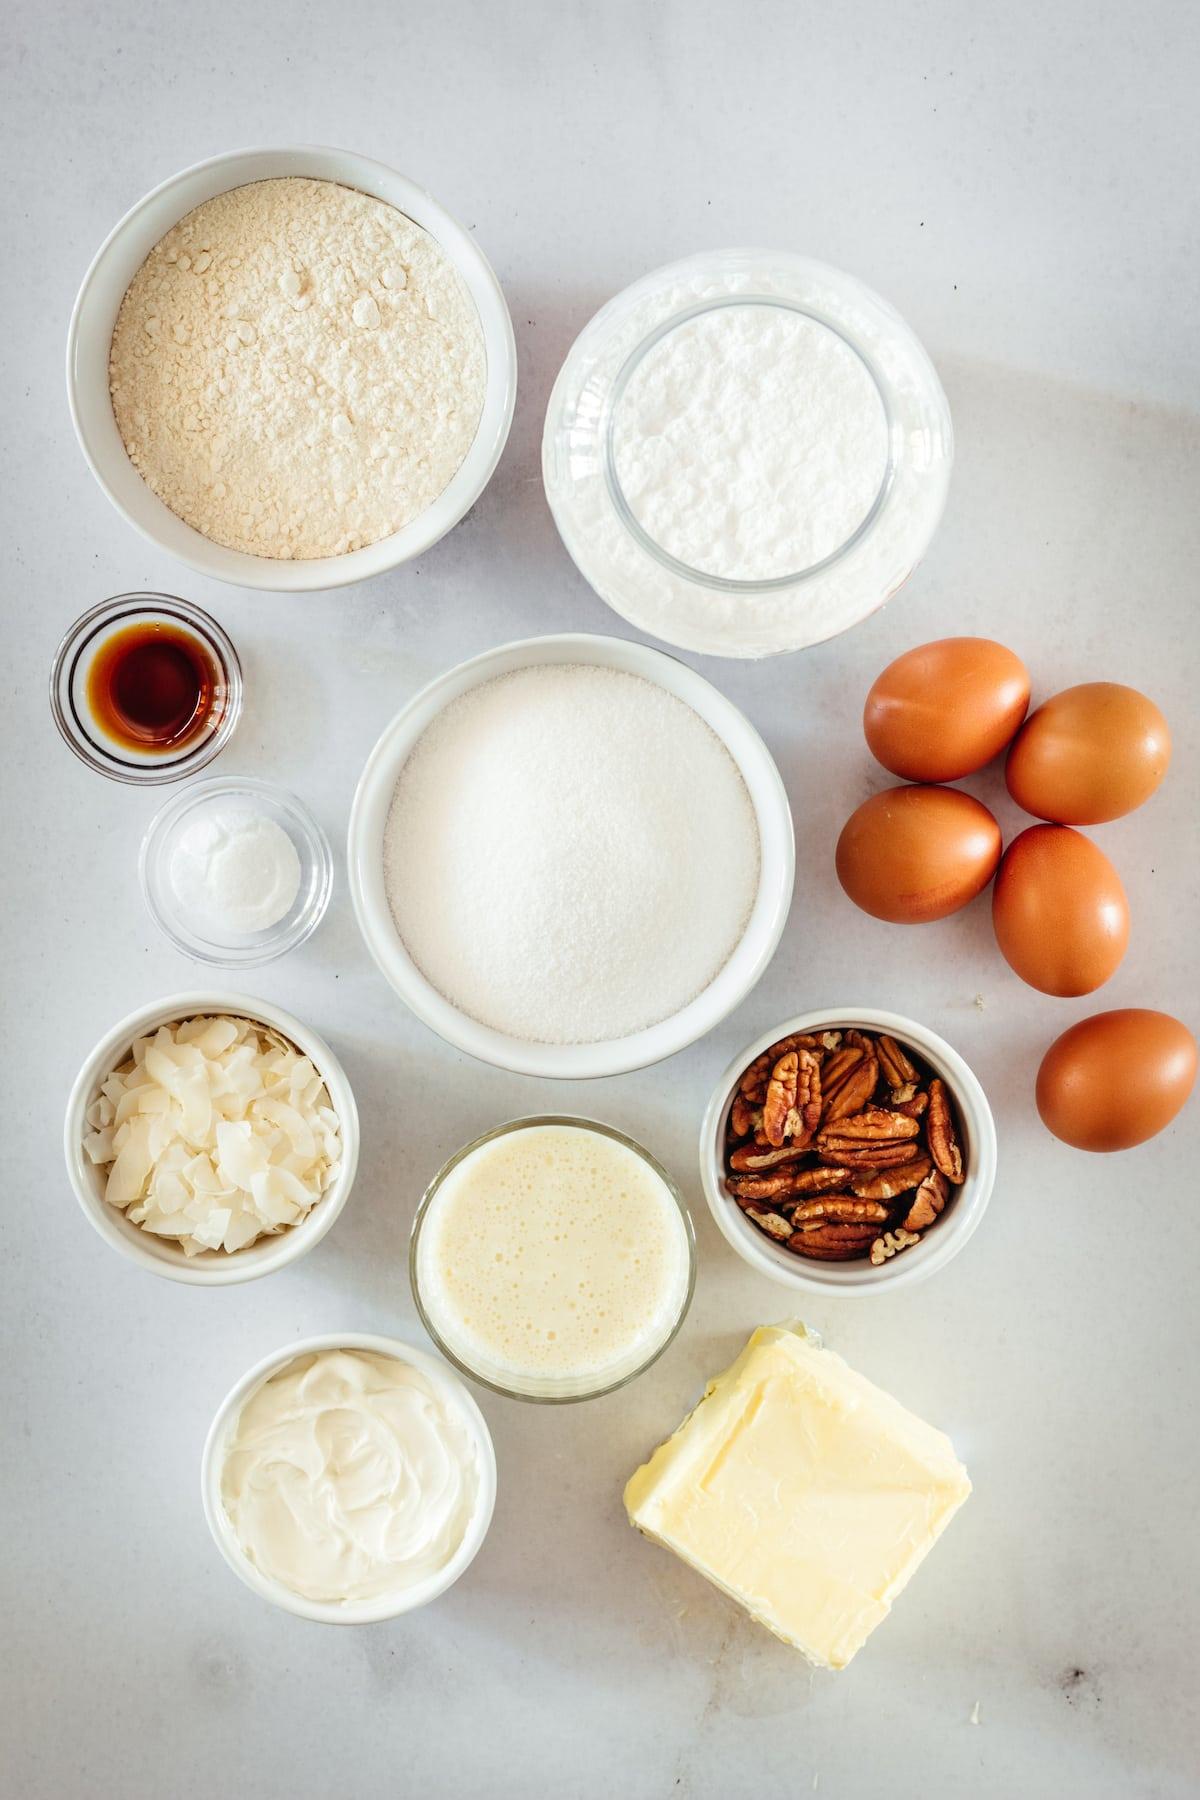 Overhead shot of ingredients for Italian Cream Cake